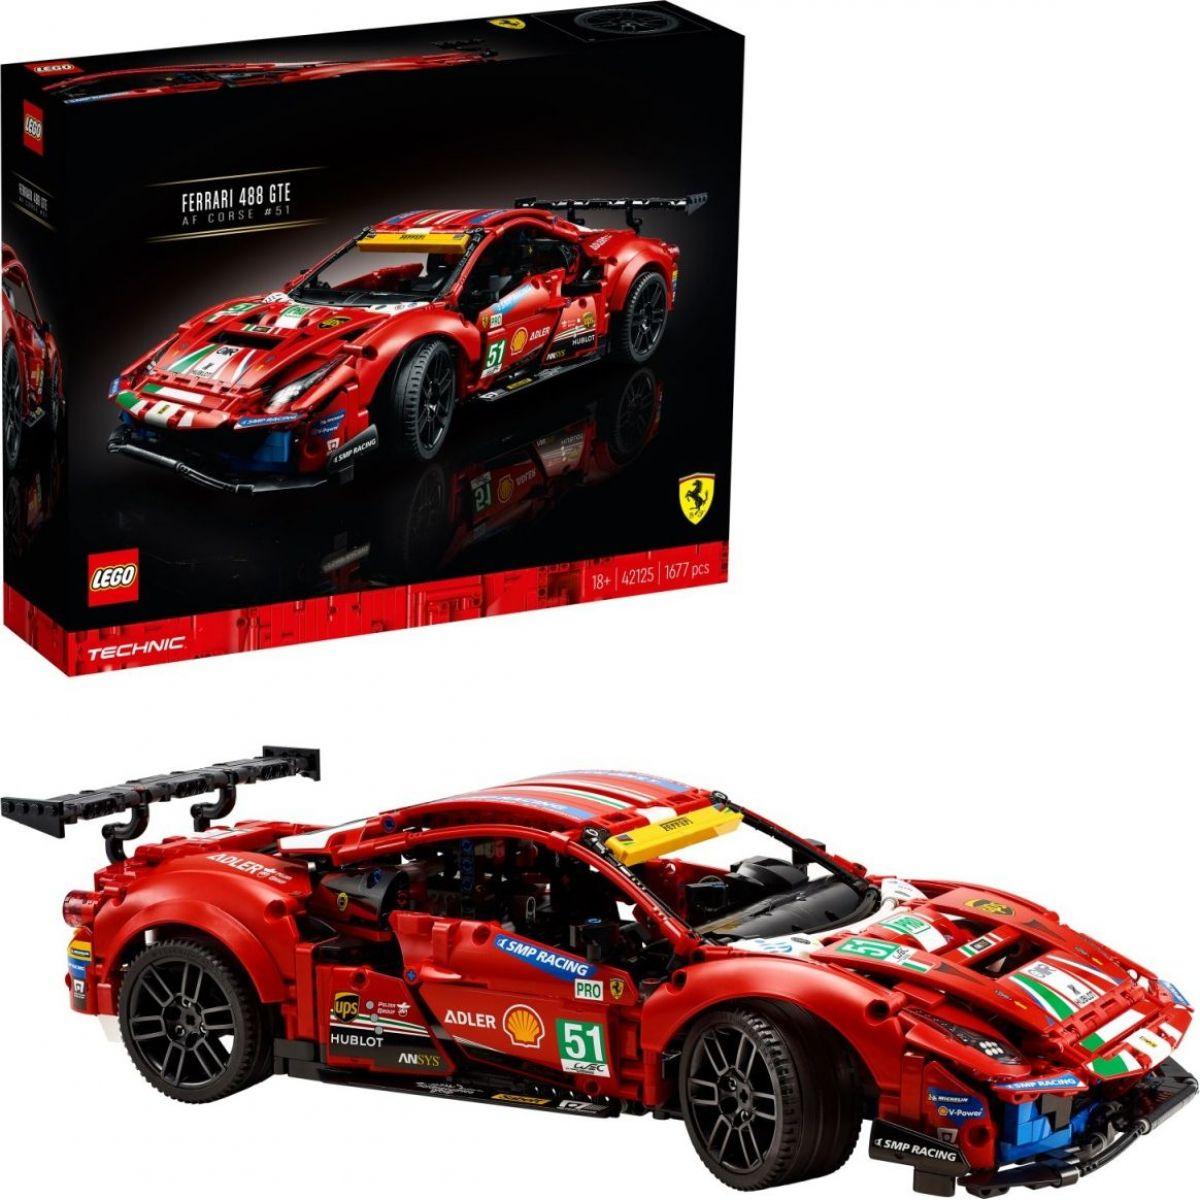 LEGO® Technic 42125 Ferrari 488 GTE AF Corse 51